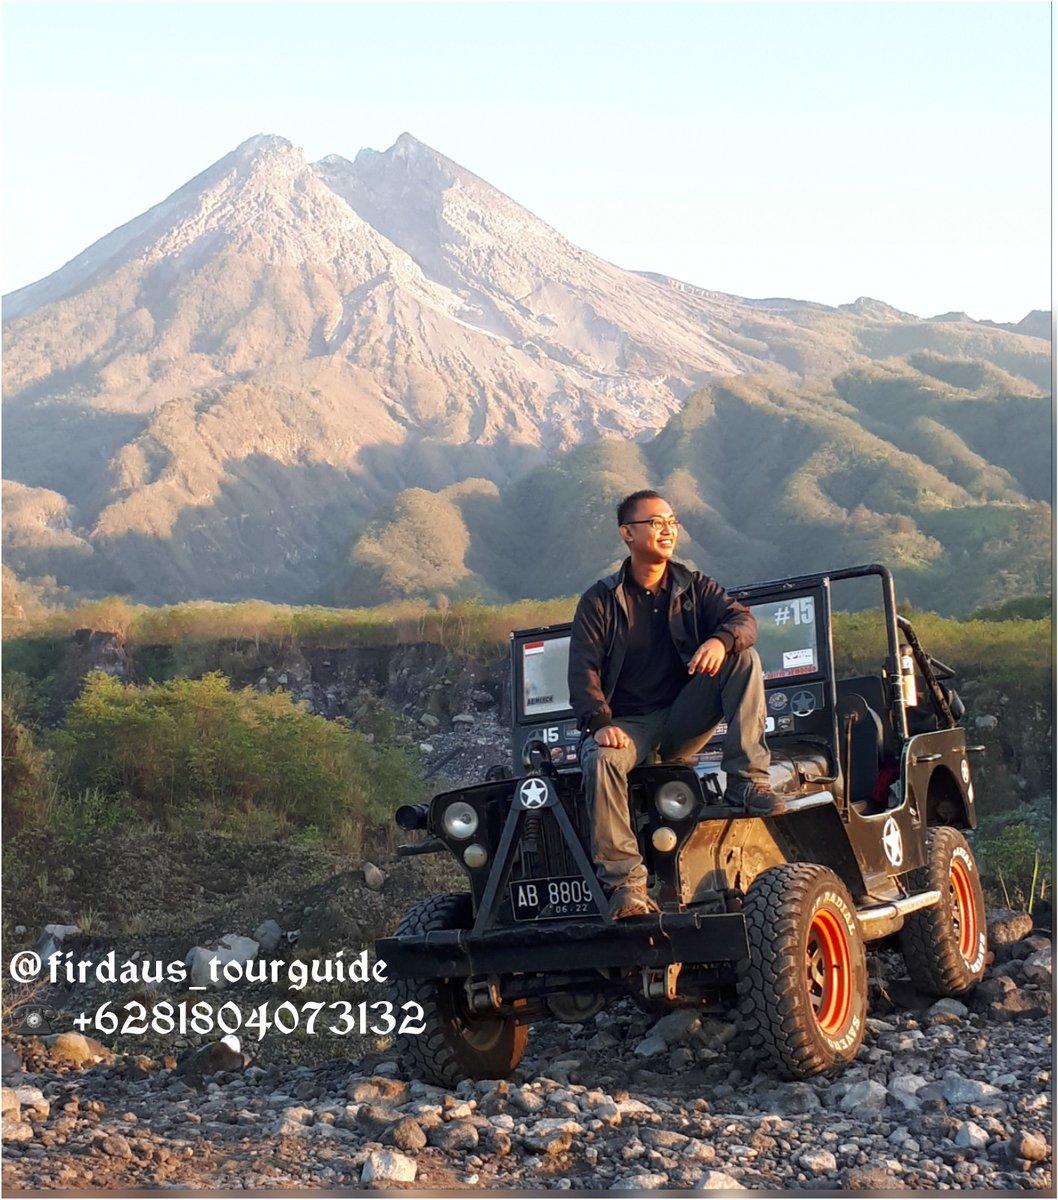 Kangen menikmati keindahan #Gunung Merapi dgn #Wisata Offroad Jeep Merapi #TetepDiRumahAja #StayAtHome  Disimpan dl buat list piknik kl corona sdh berlalu ya  Come & Travel With Me #WisataJogja#DolanJogja #TourGuide #TourGuideJogja #RentCar #SewaMobilJogja #WonderfullIndonesia pic.twitter.com/NtI1sq6UoA